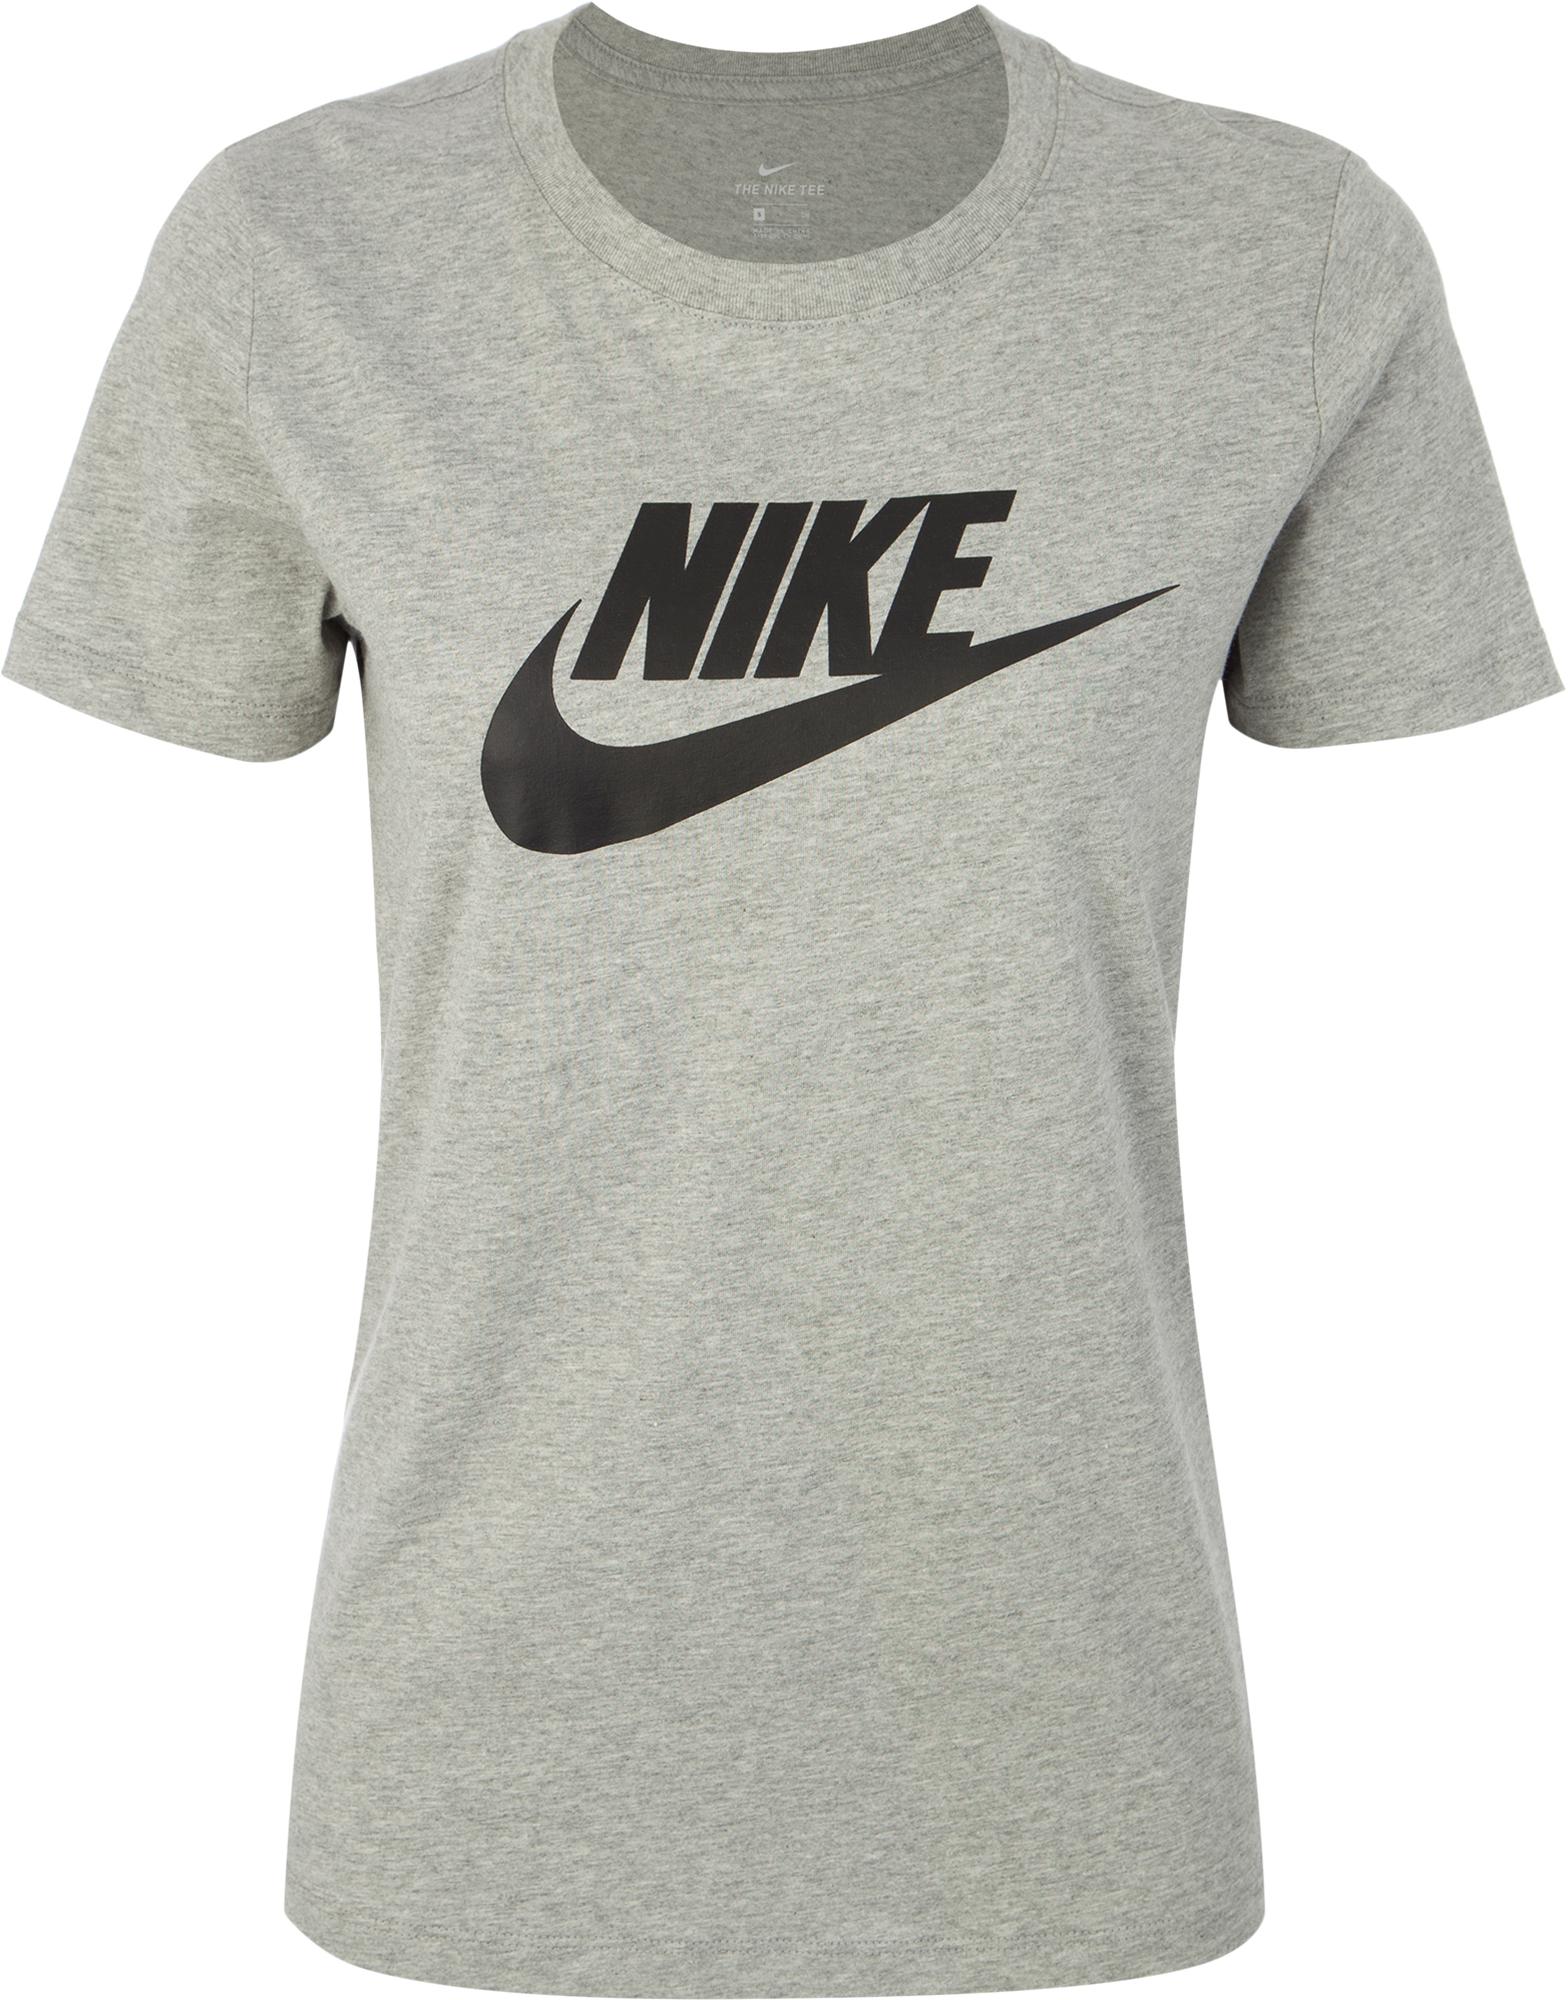 Nike Футболка женская Nike Sportswear, размер 46-48 цена